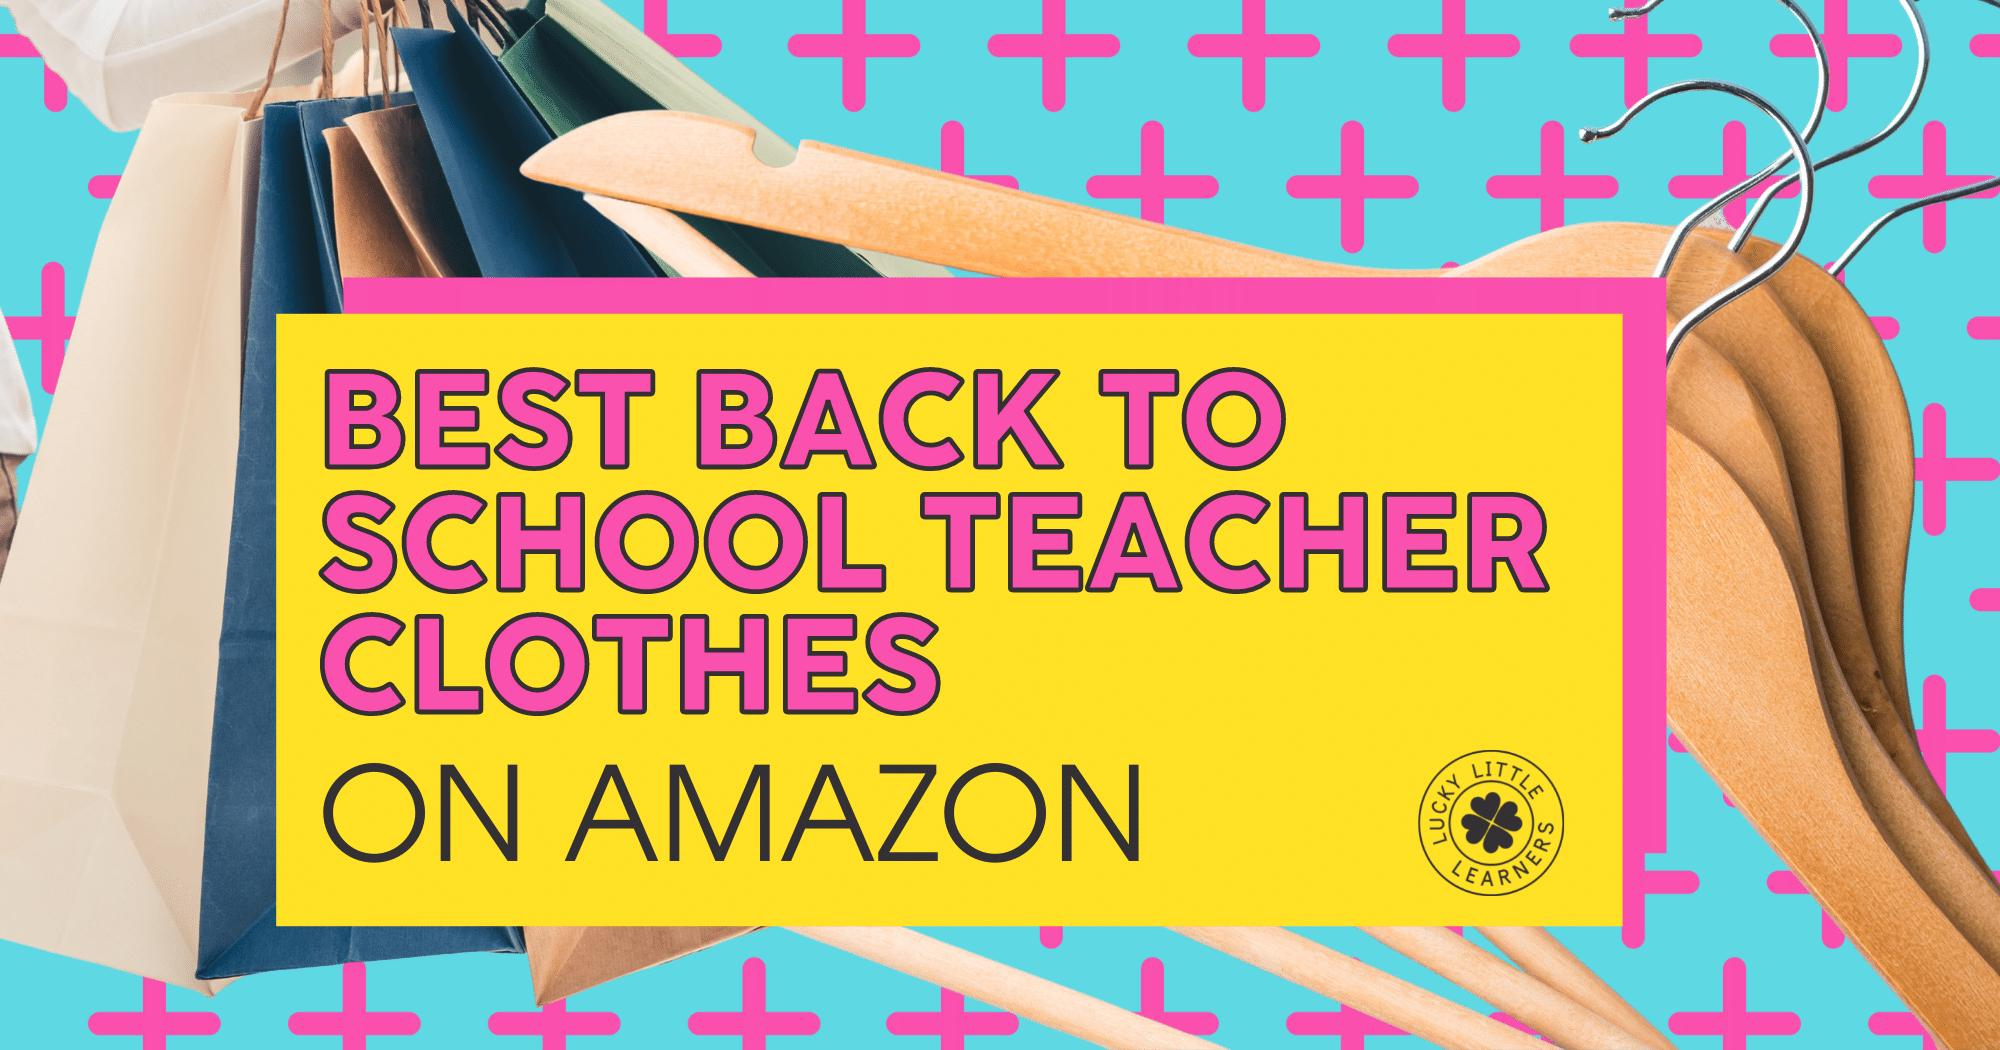 best back to school teacher clothes on amazon